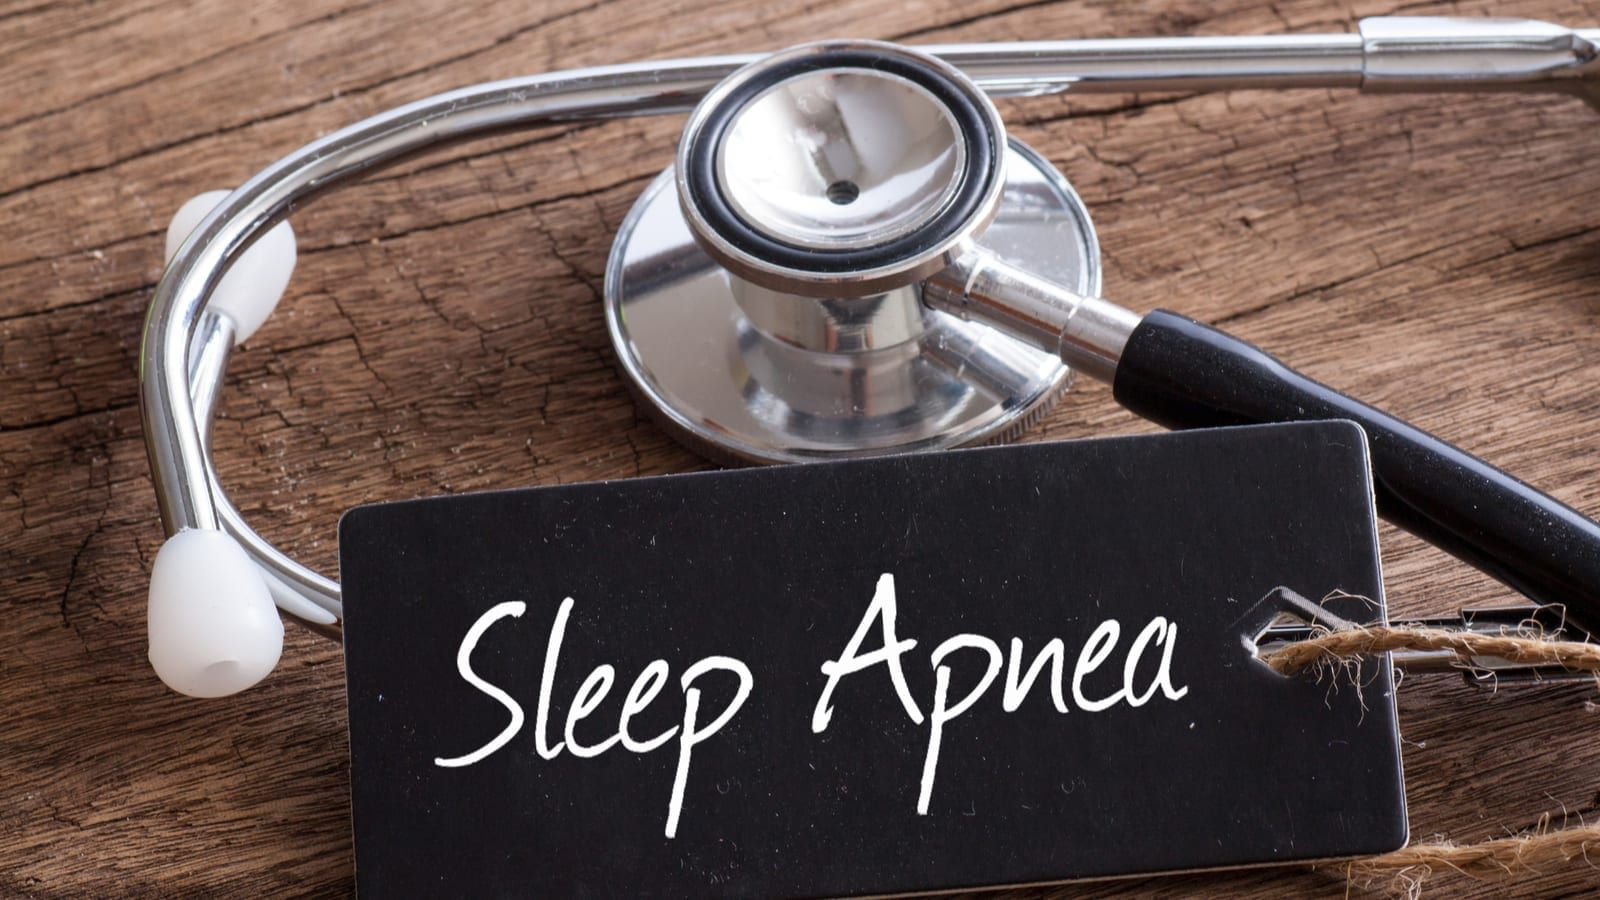 Stethoscope and sleep apnea